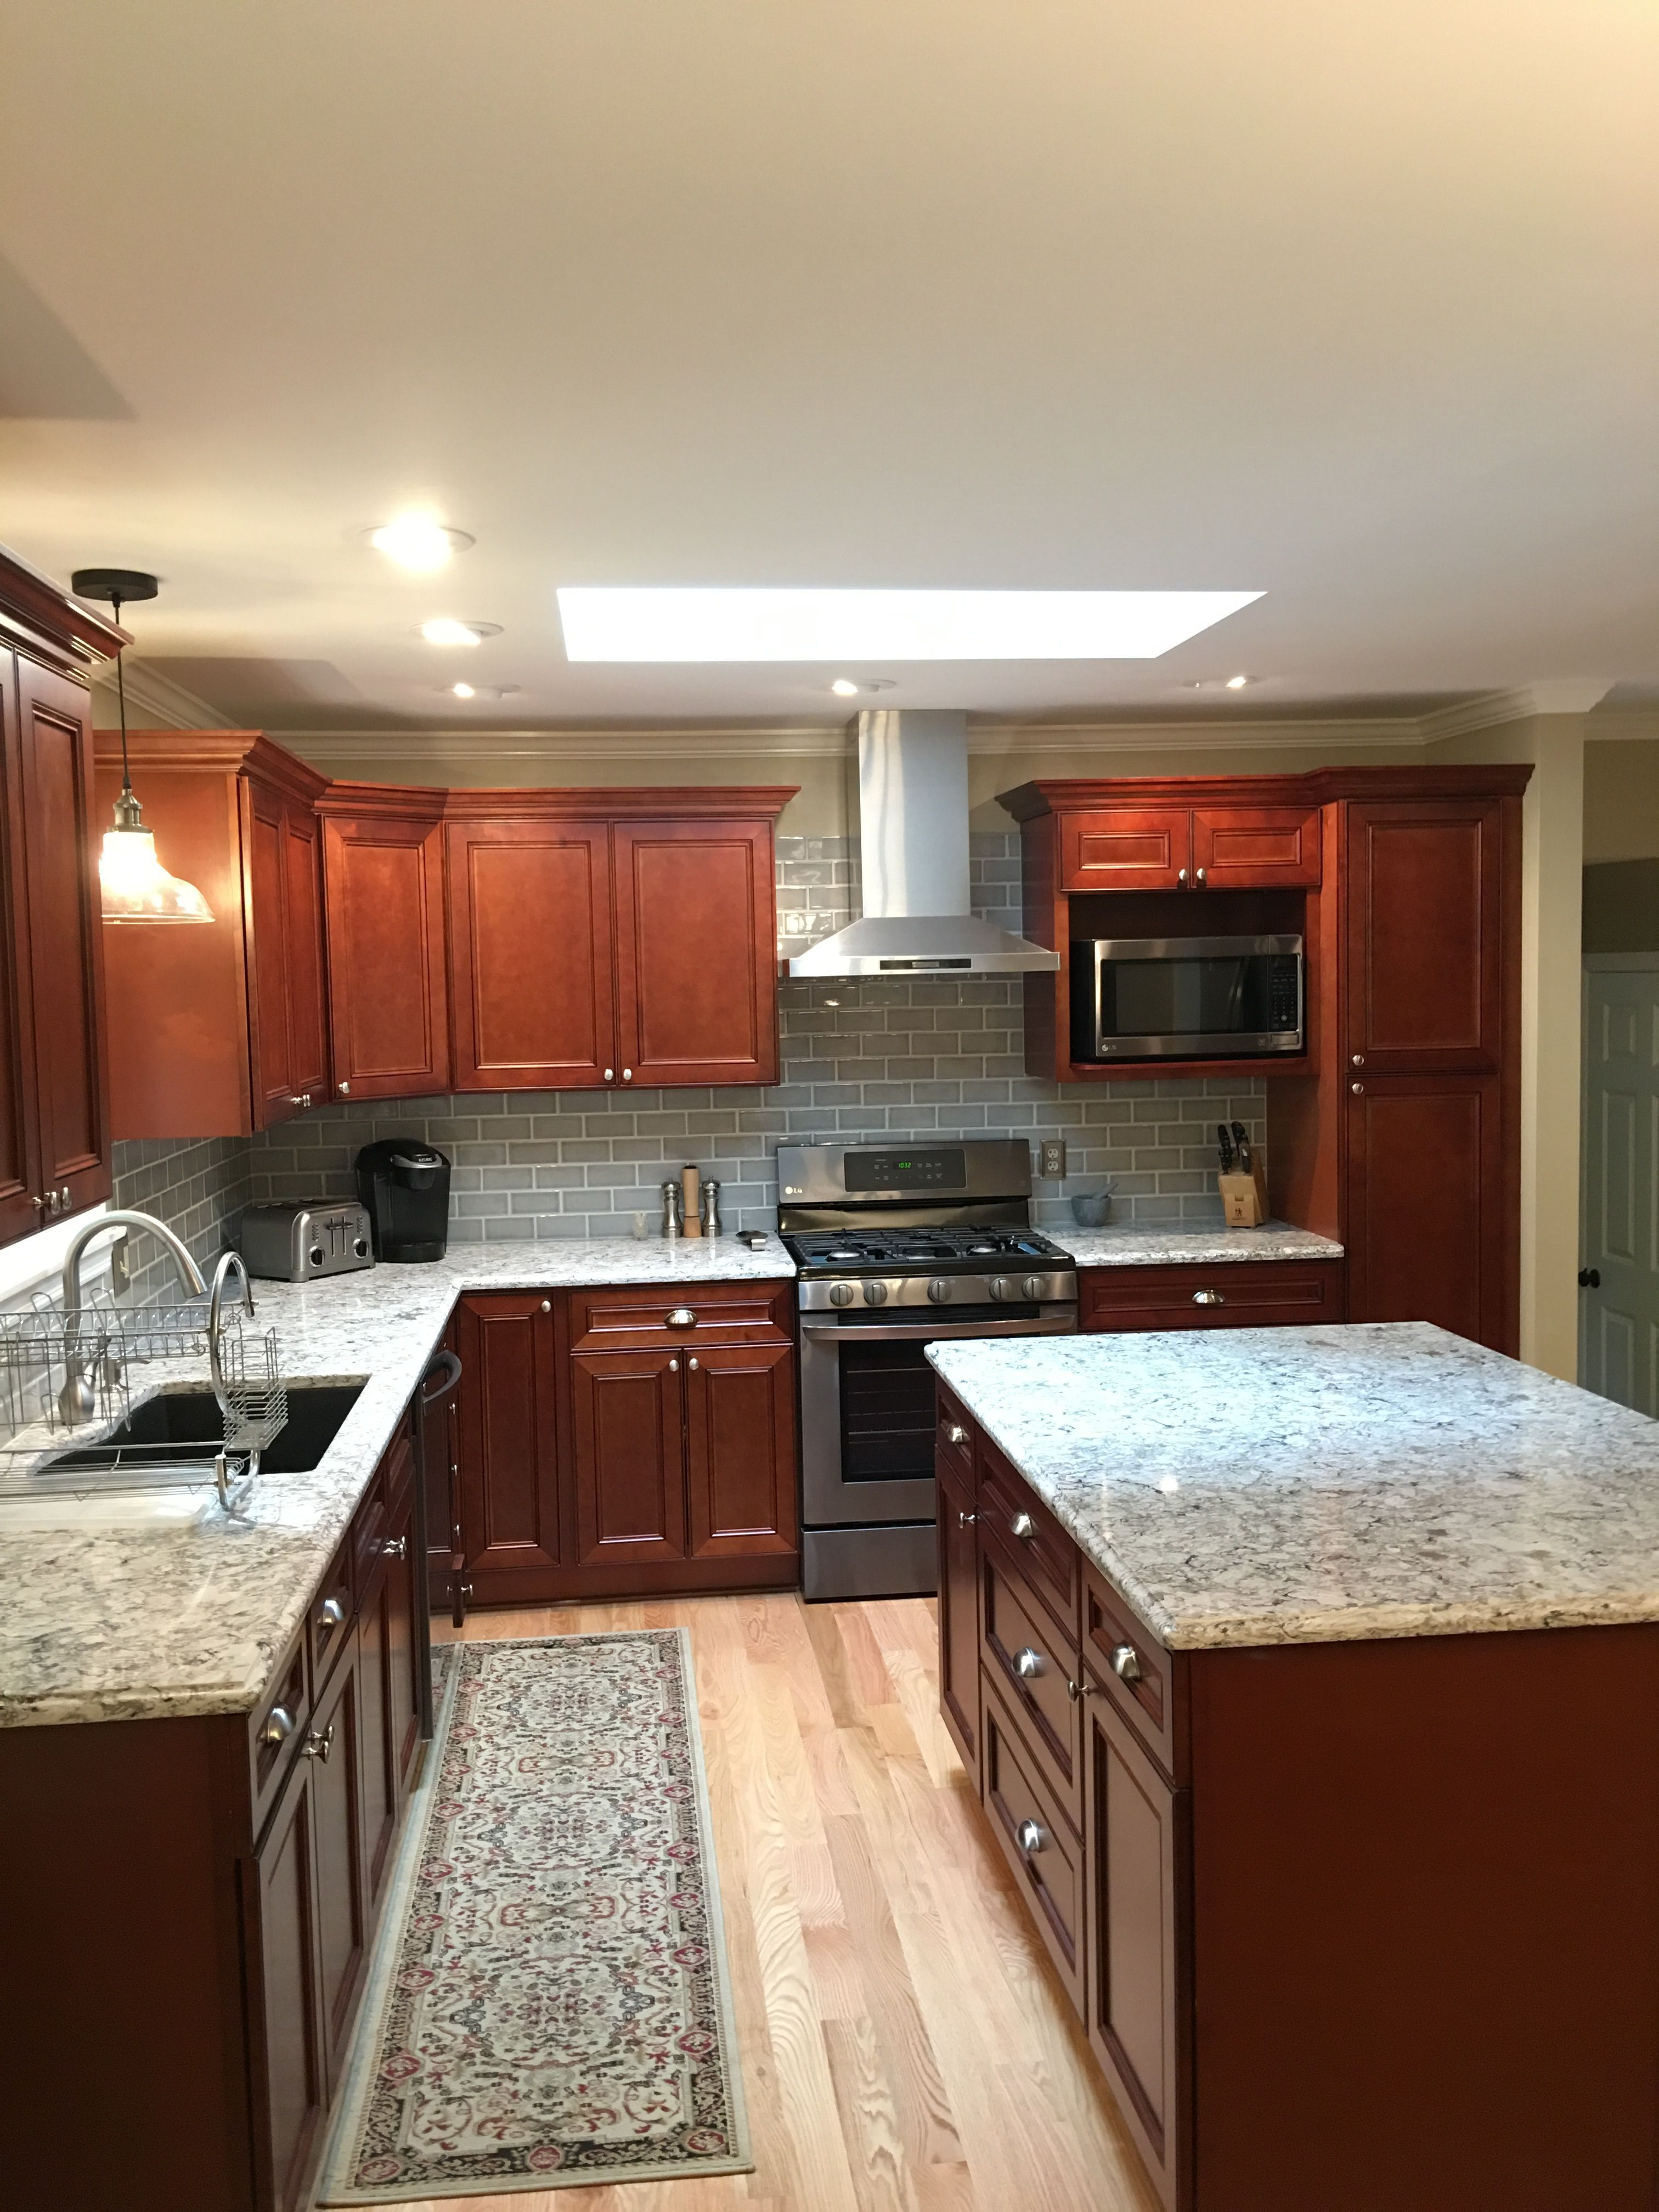 Pin On Home Decor Kitchen